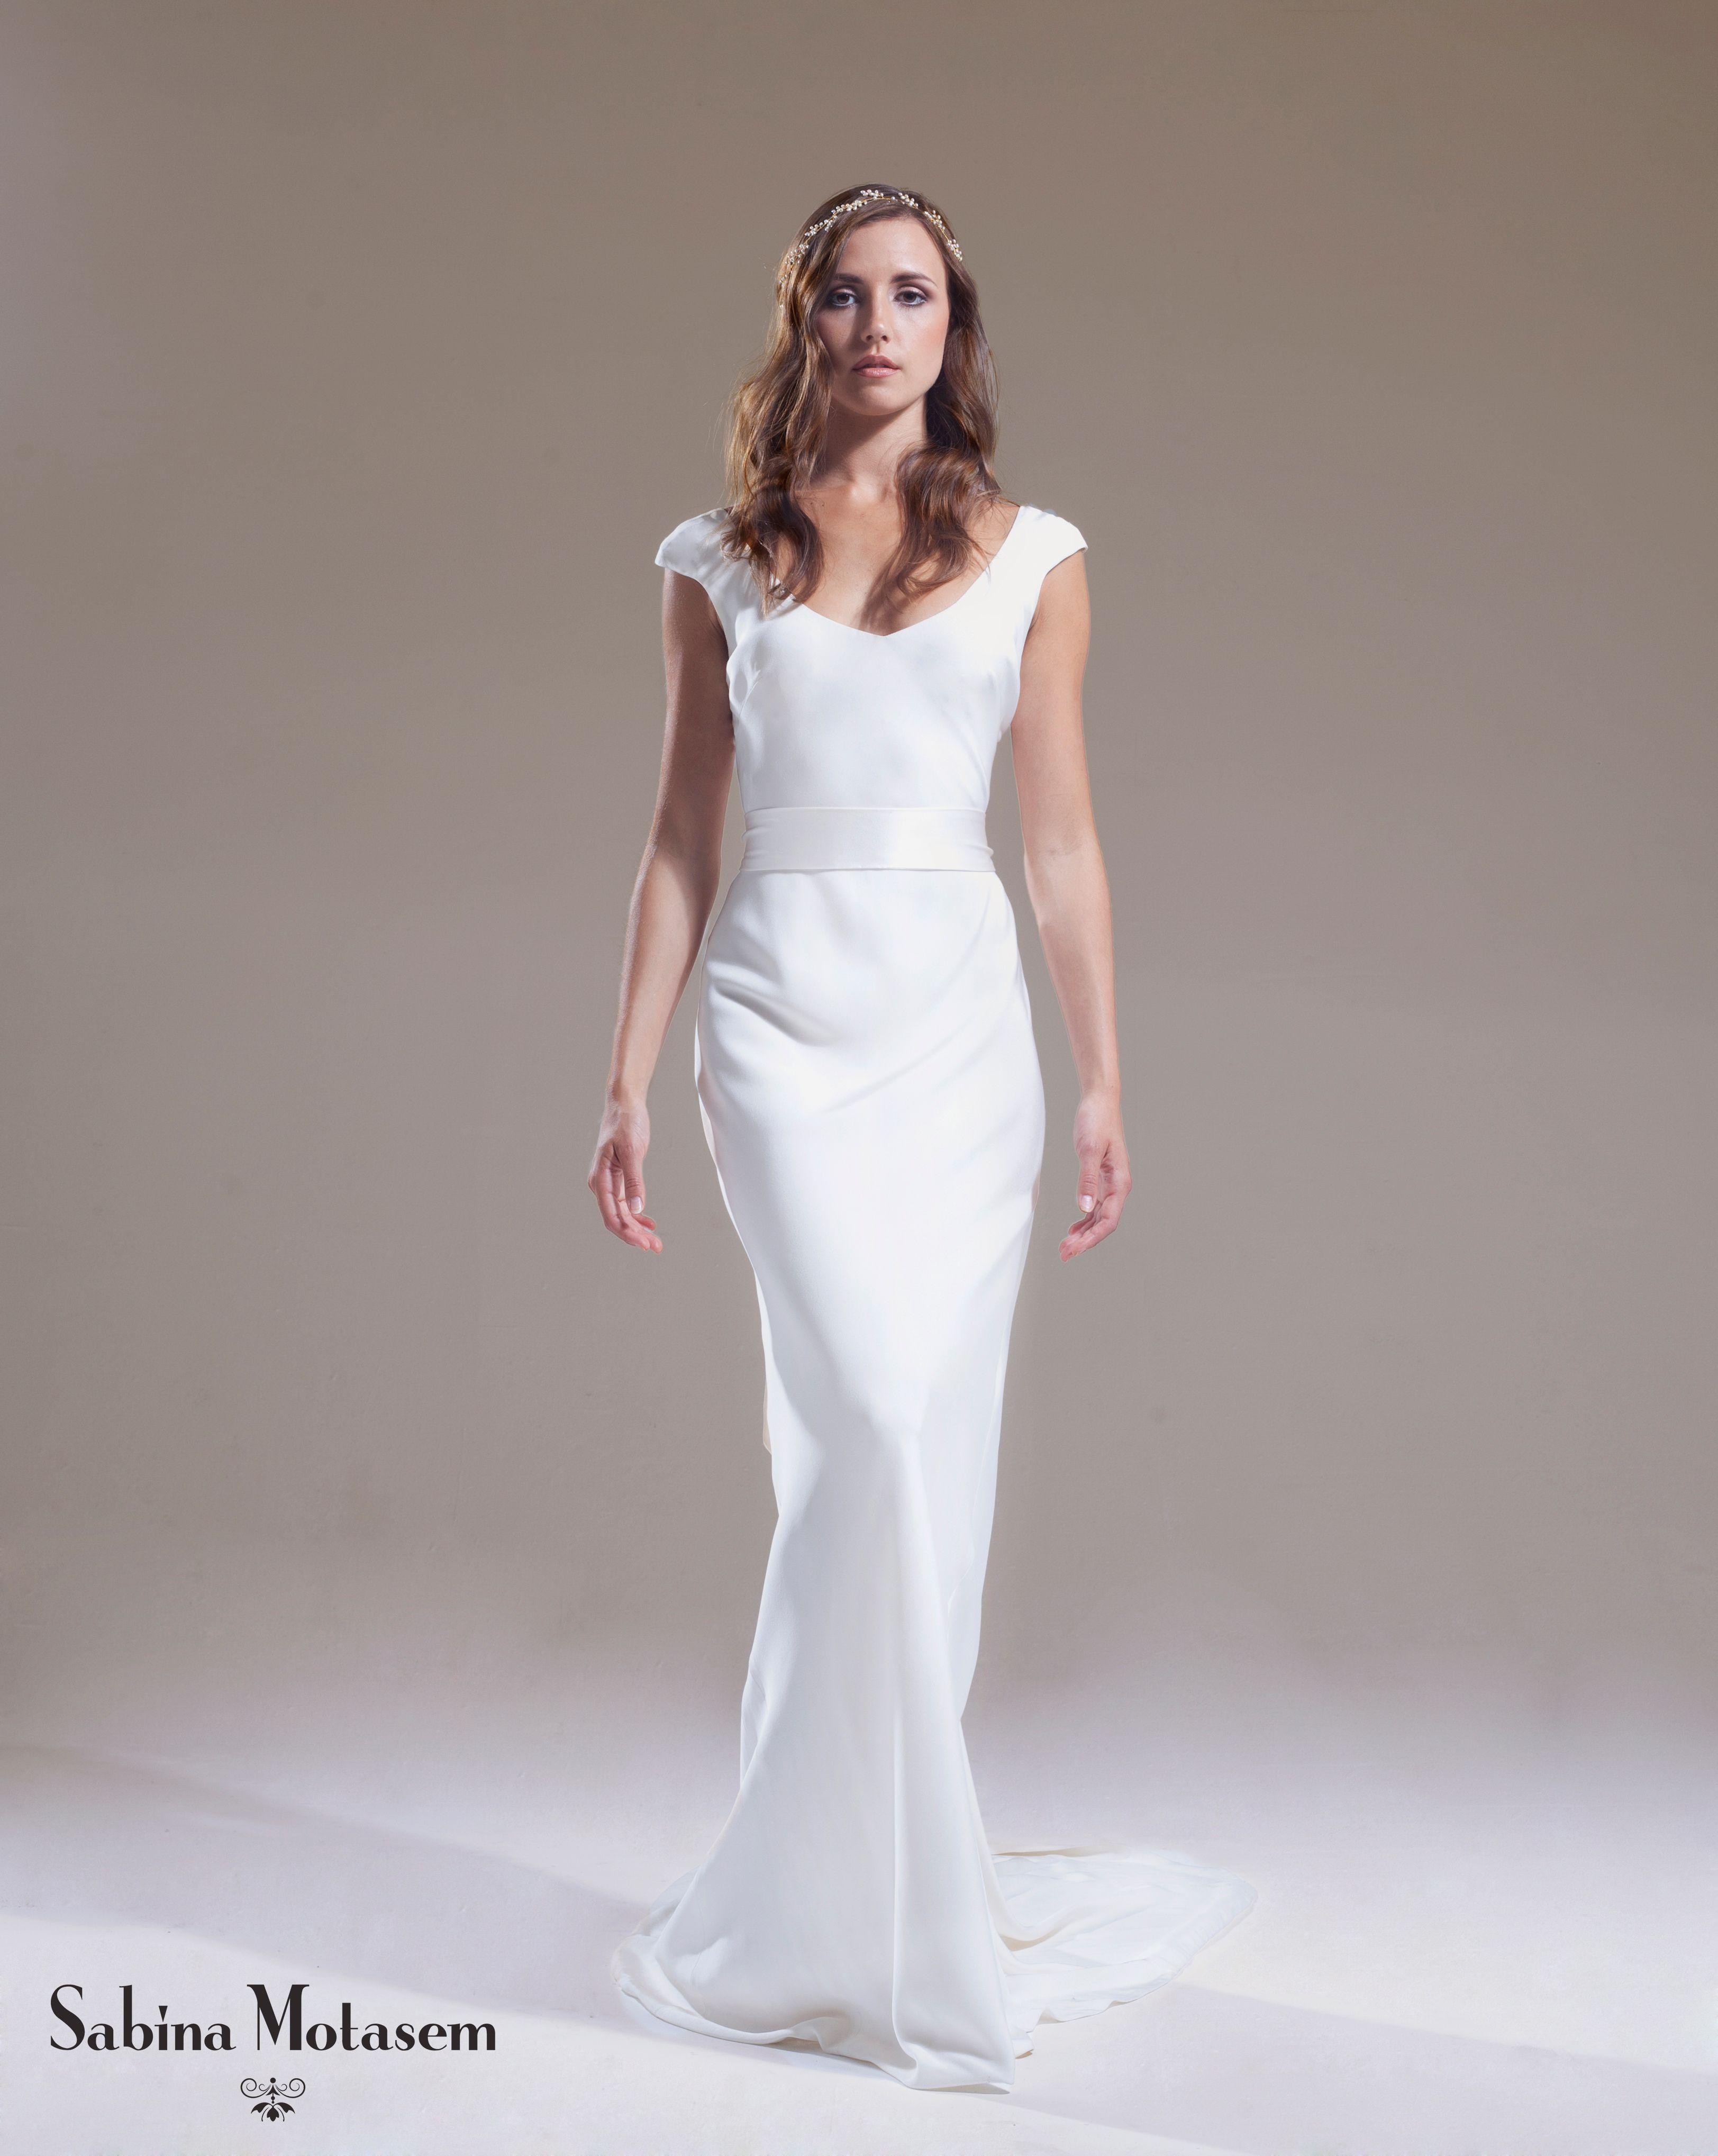 The Lilian dress  – Sabina Motasem. A bias cut, backless, slinky wedding dress with cap sleeves and a puddle train, accessorised with a matching satin sash. www.motasem.co.uk #biascutweddingdress #backlessweddingdress #sabinamotasem